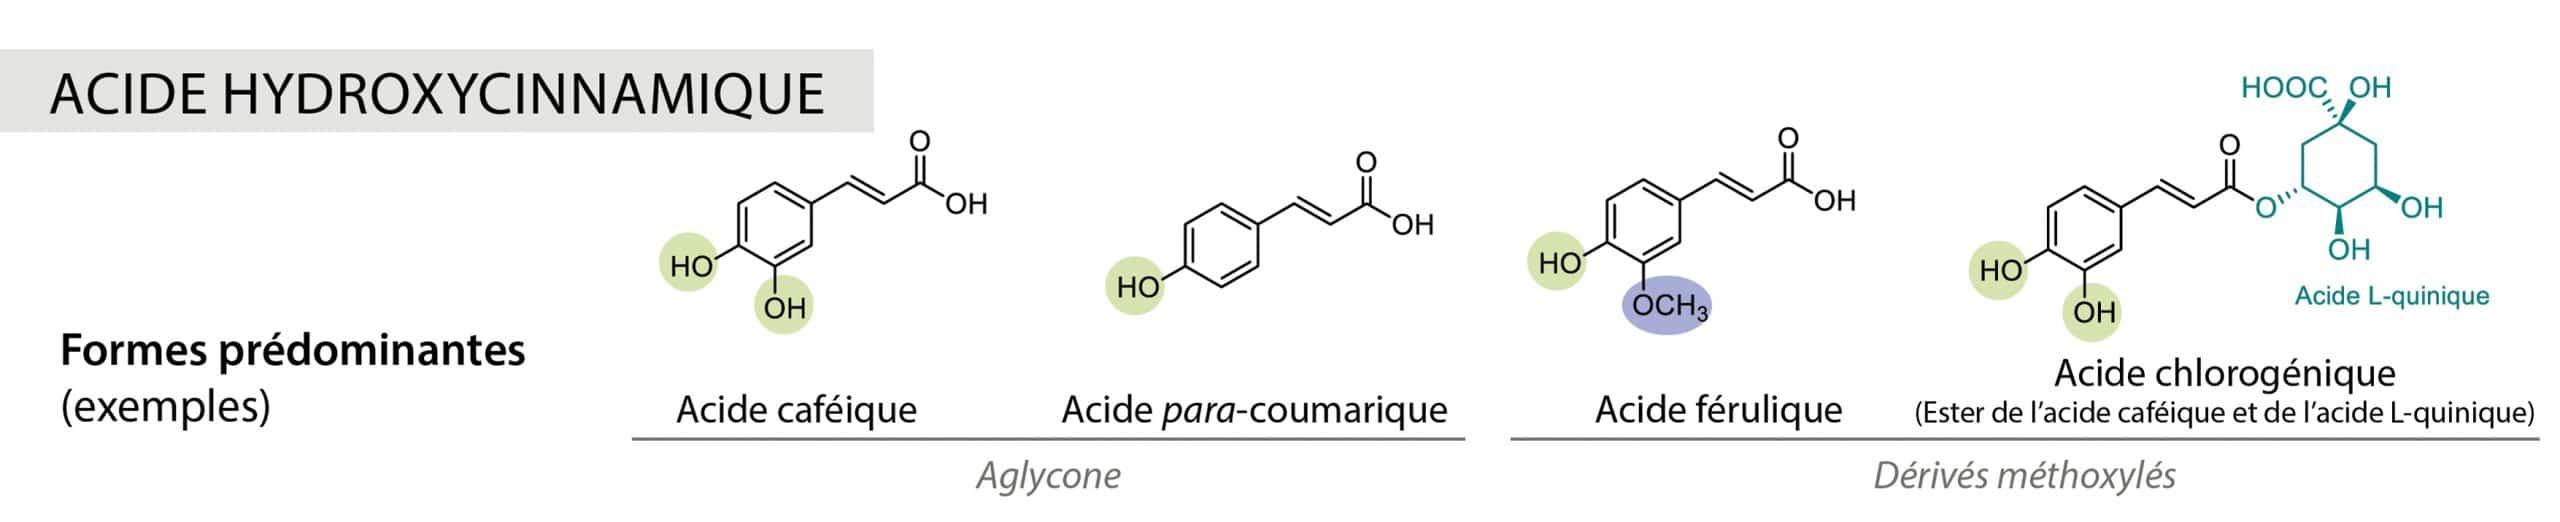 acide hydroxycinnamique Nutrixeal Info